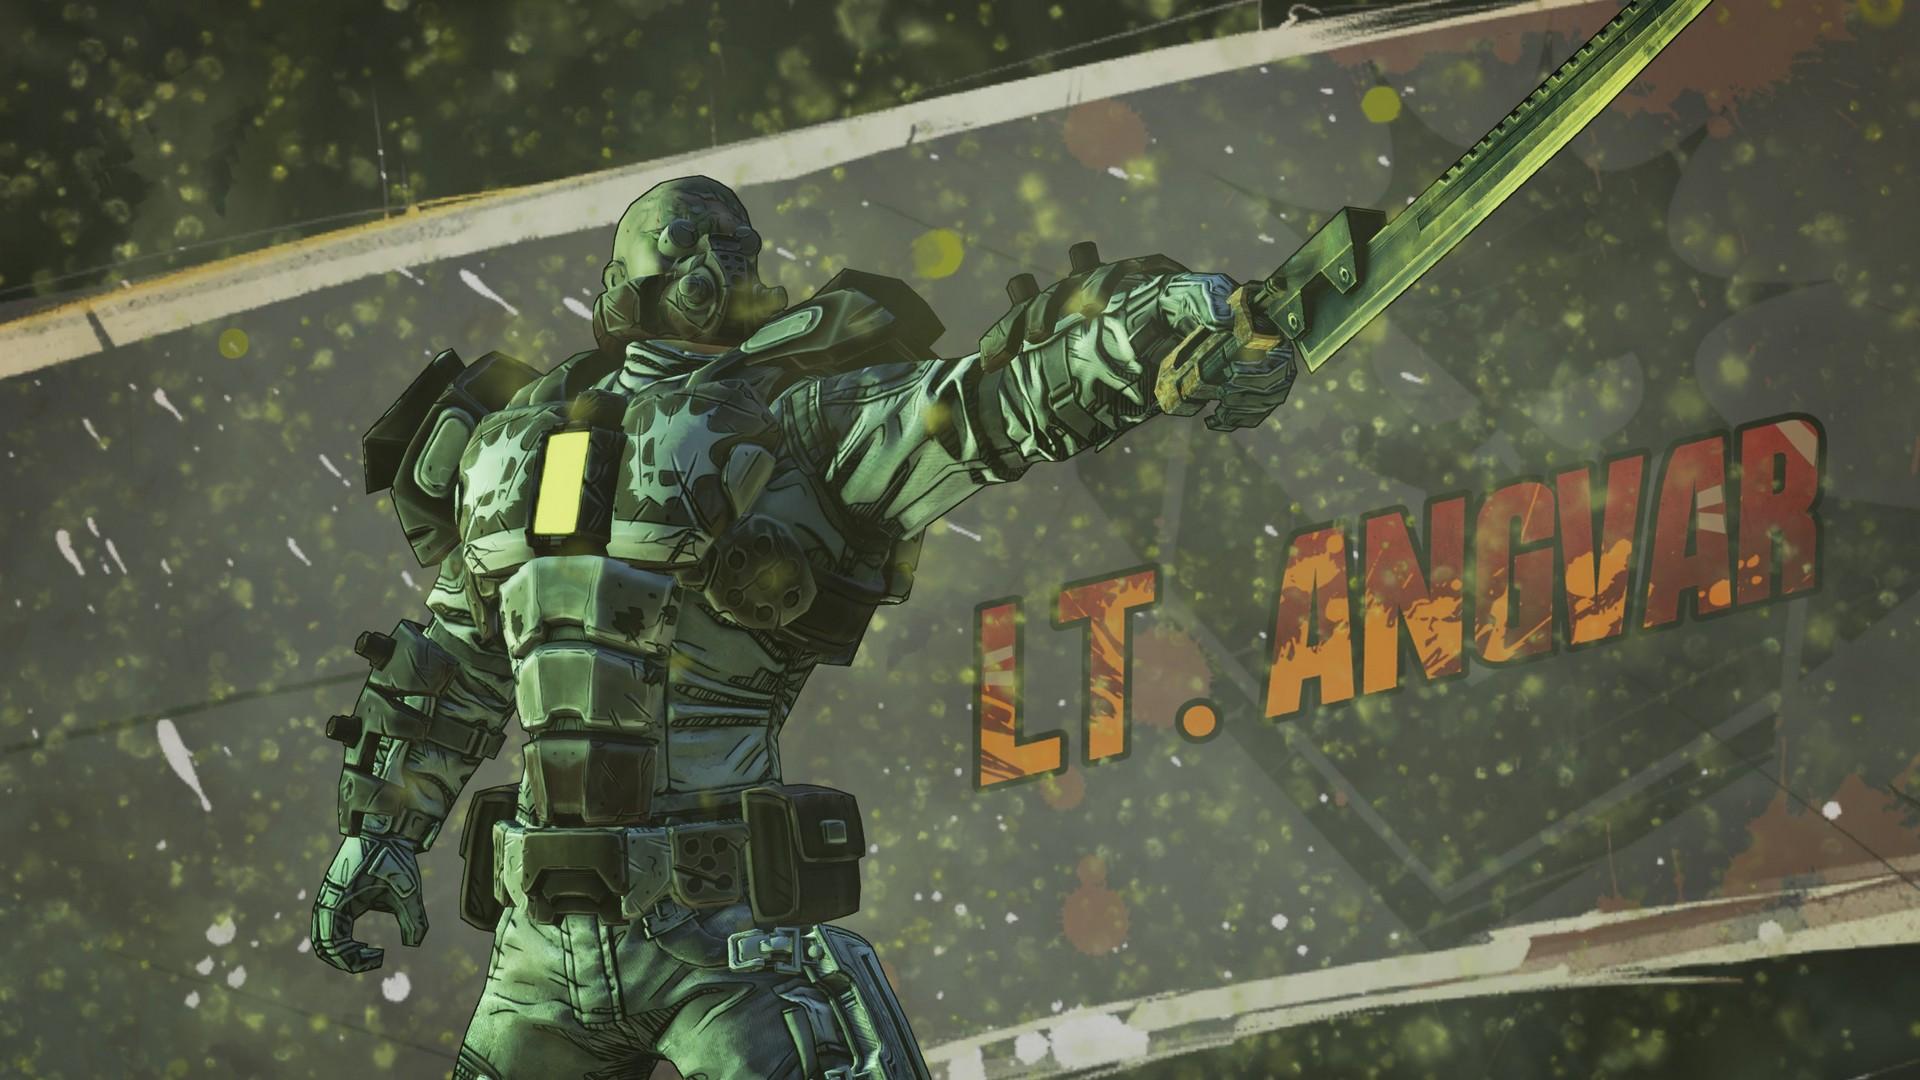 Lt. Angvar